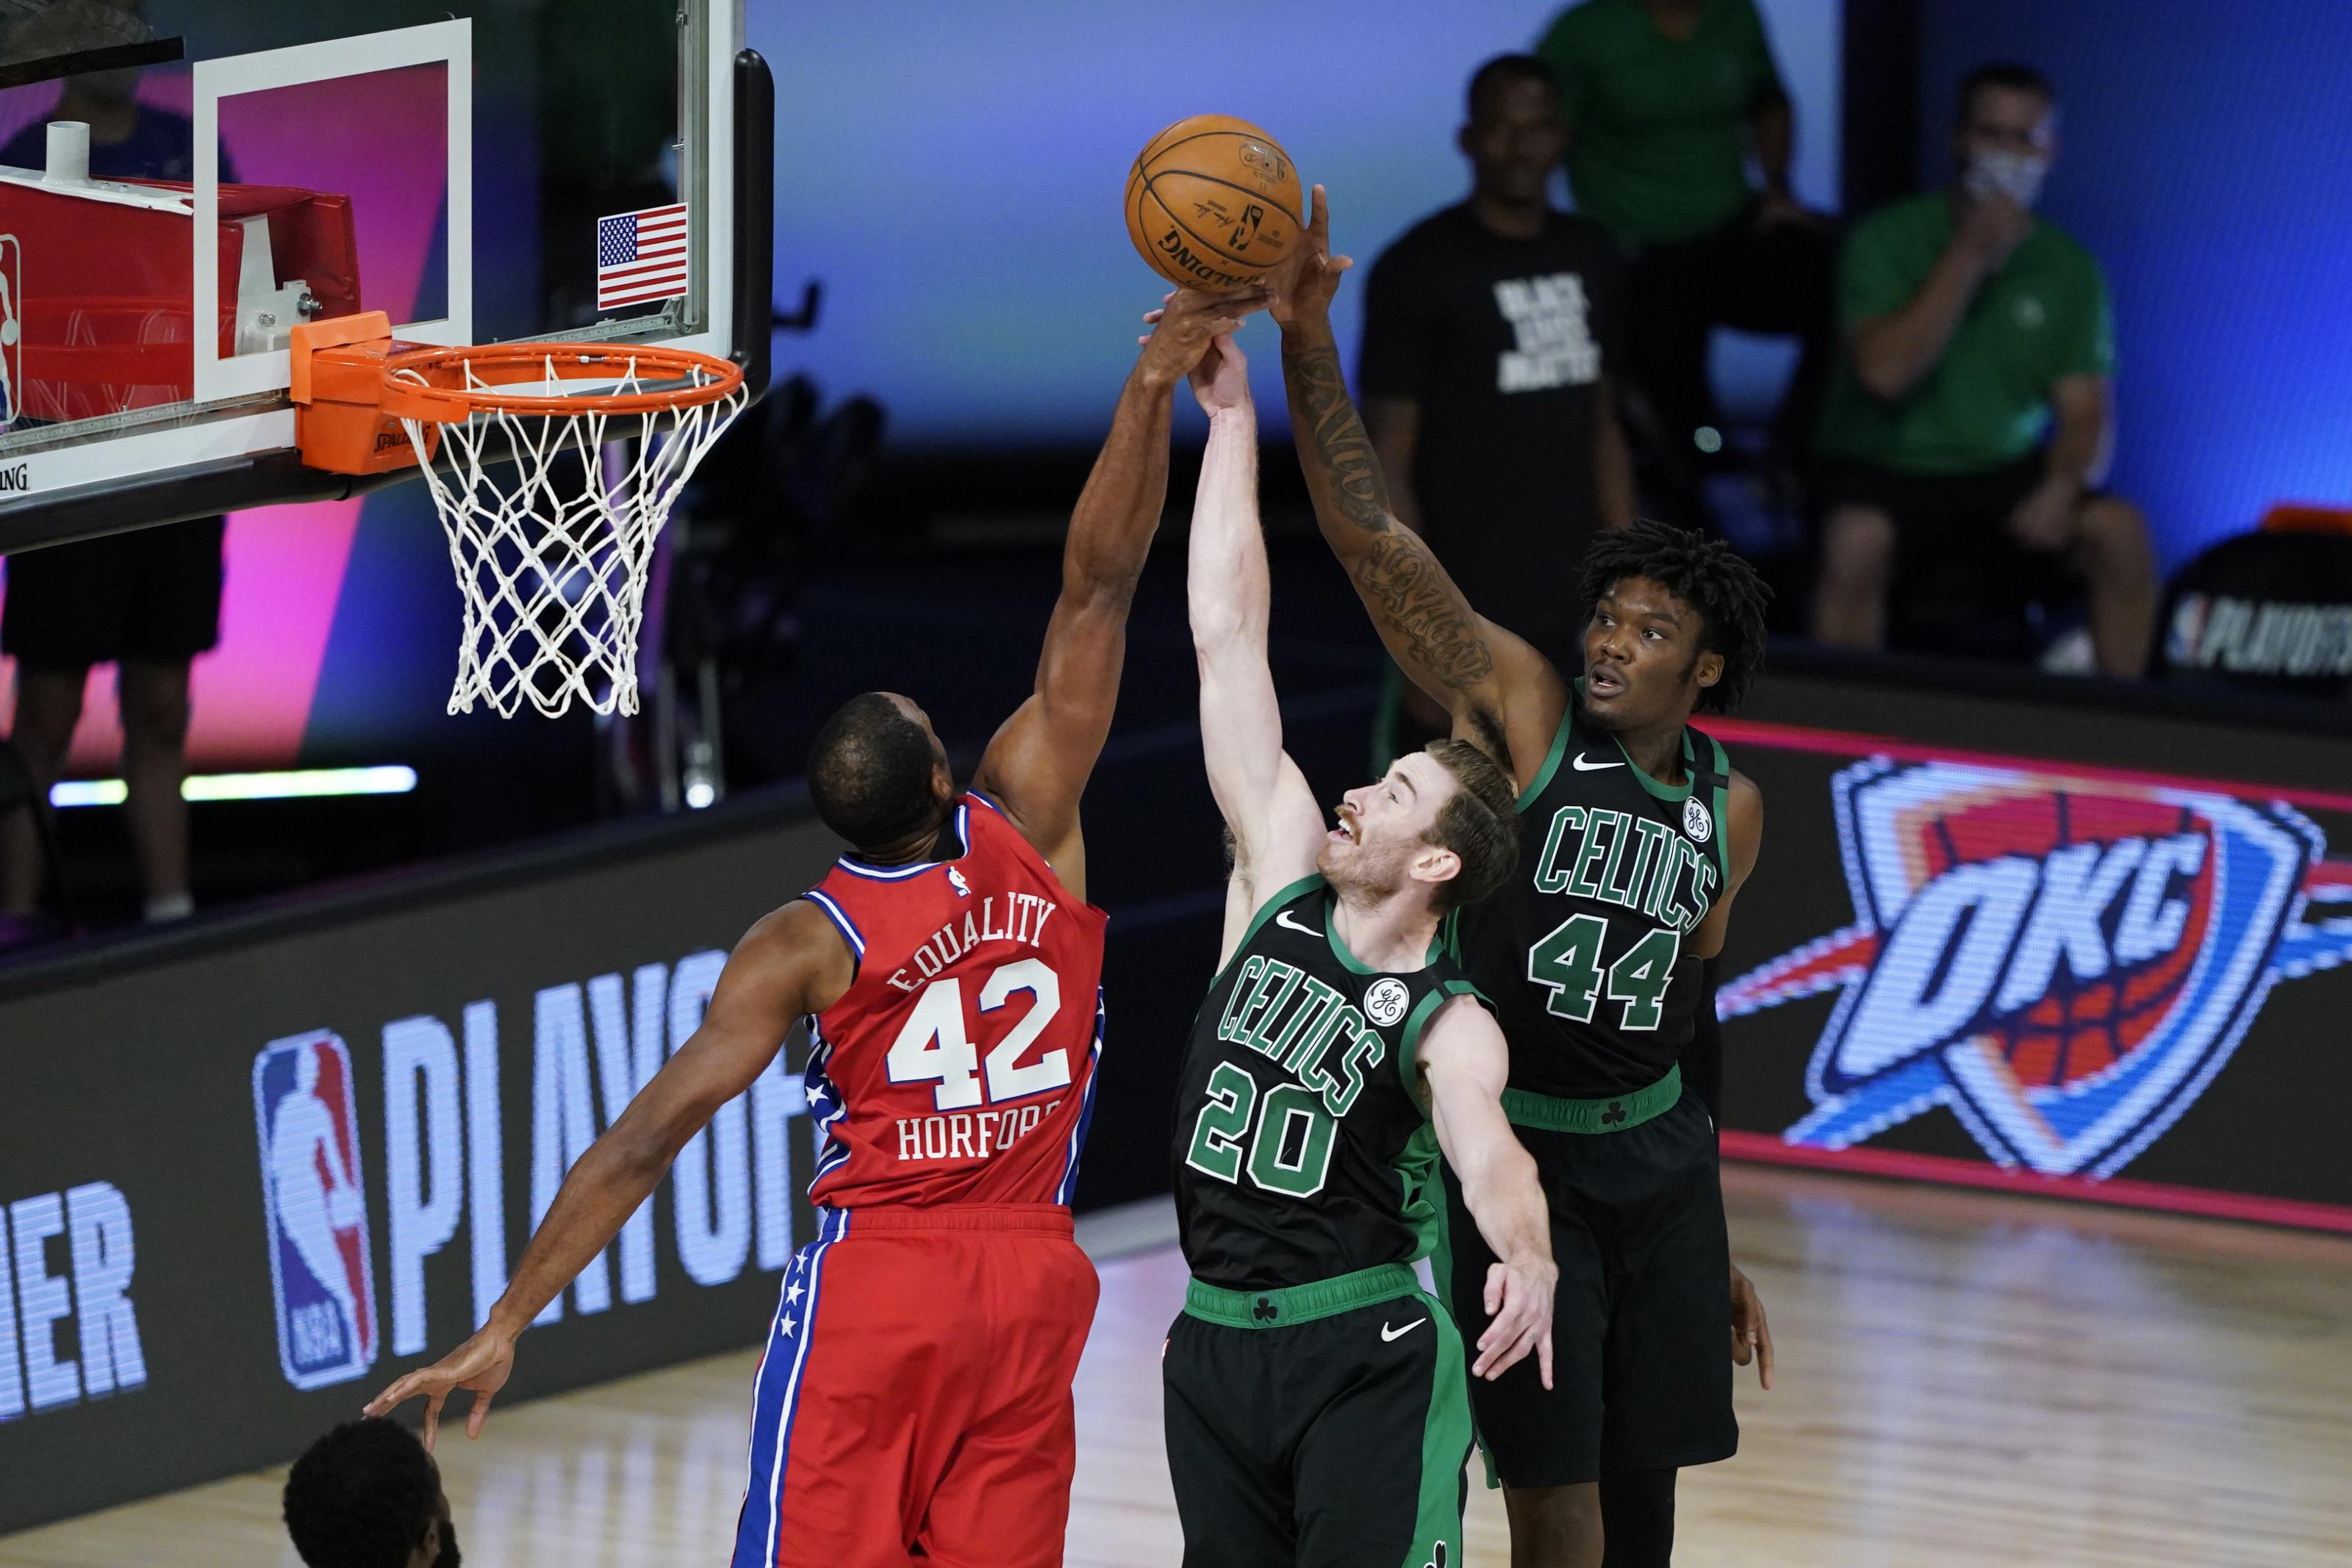 Boston Celtics 2 Offseason Gordon Hayward Trades